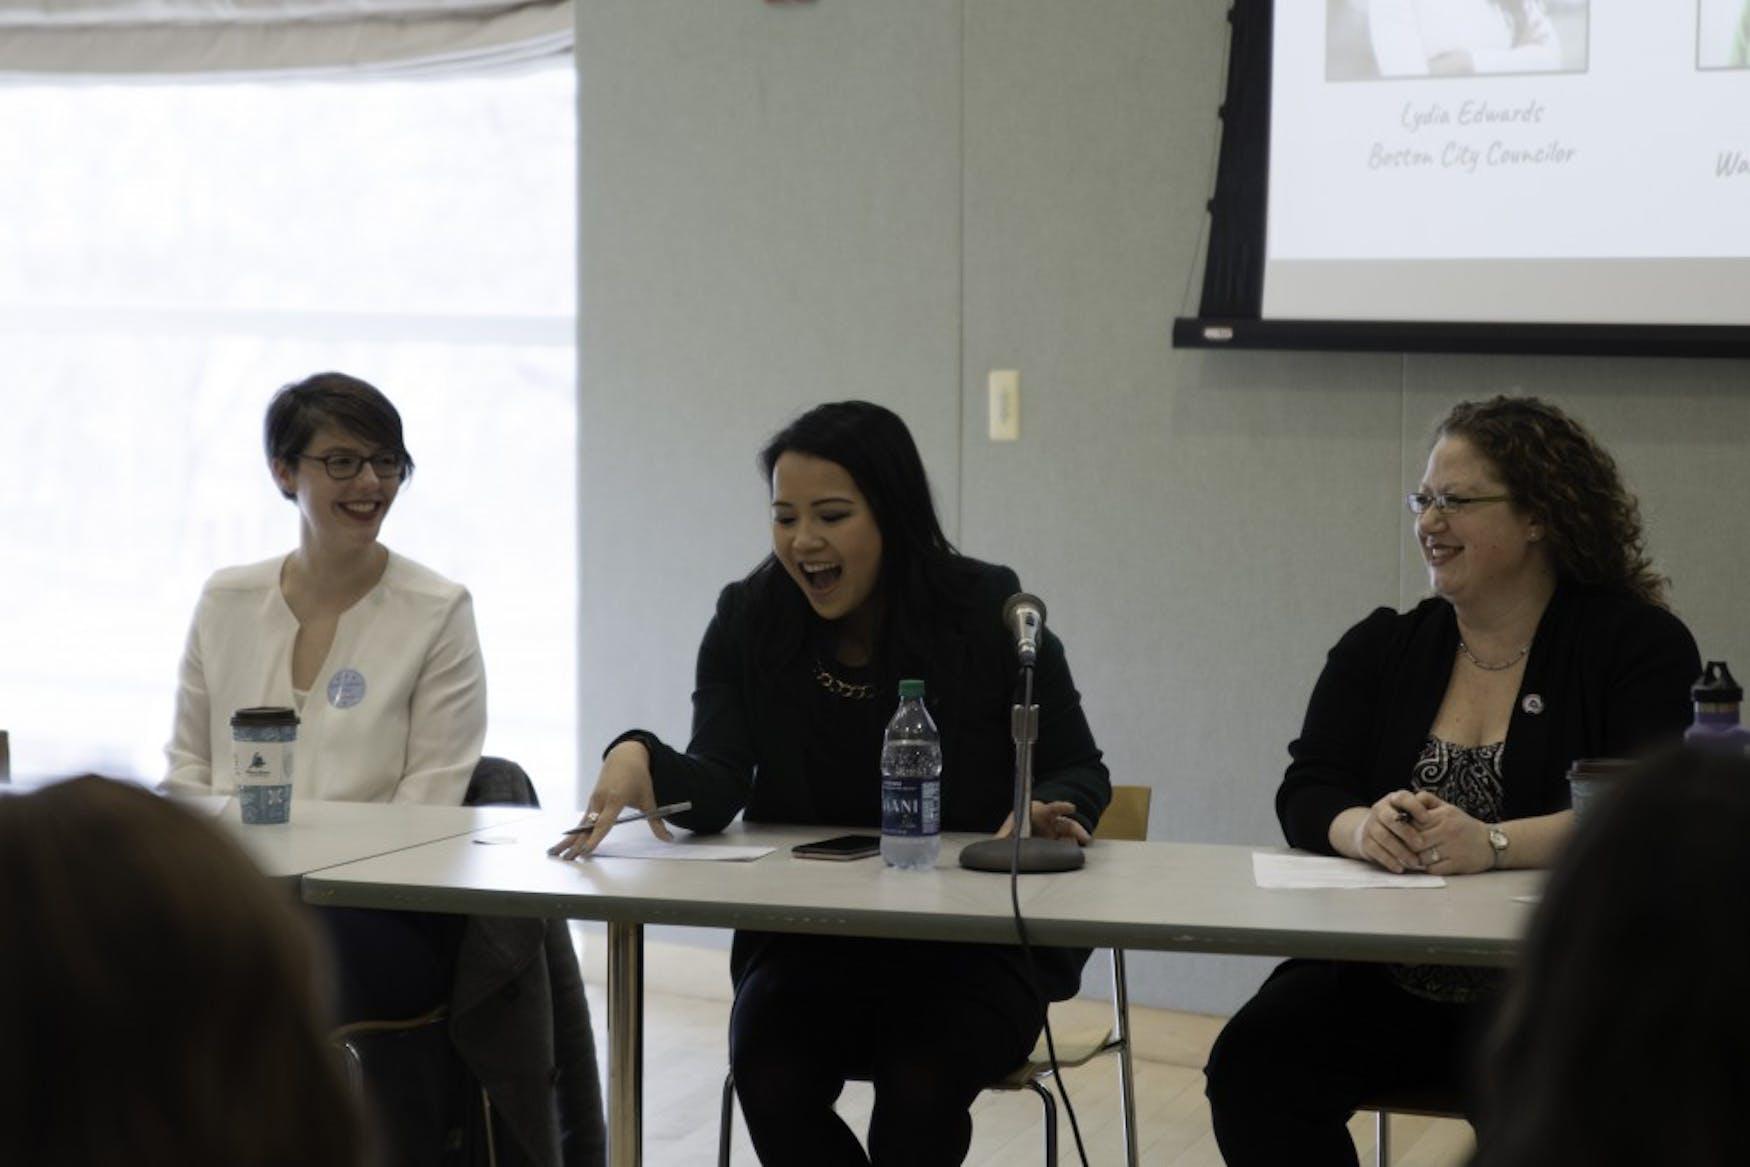 women-in-politics-panel-03-15-19-tl-0015